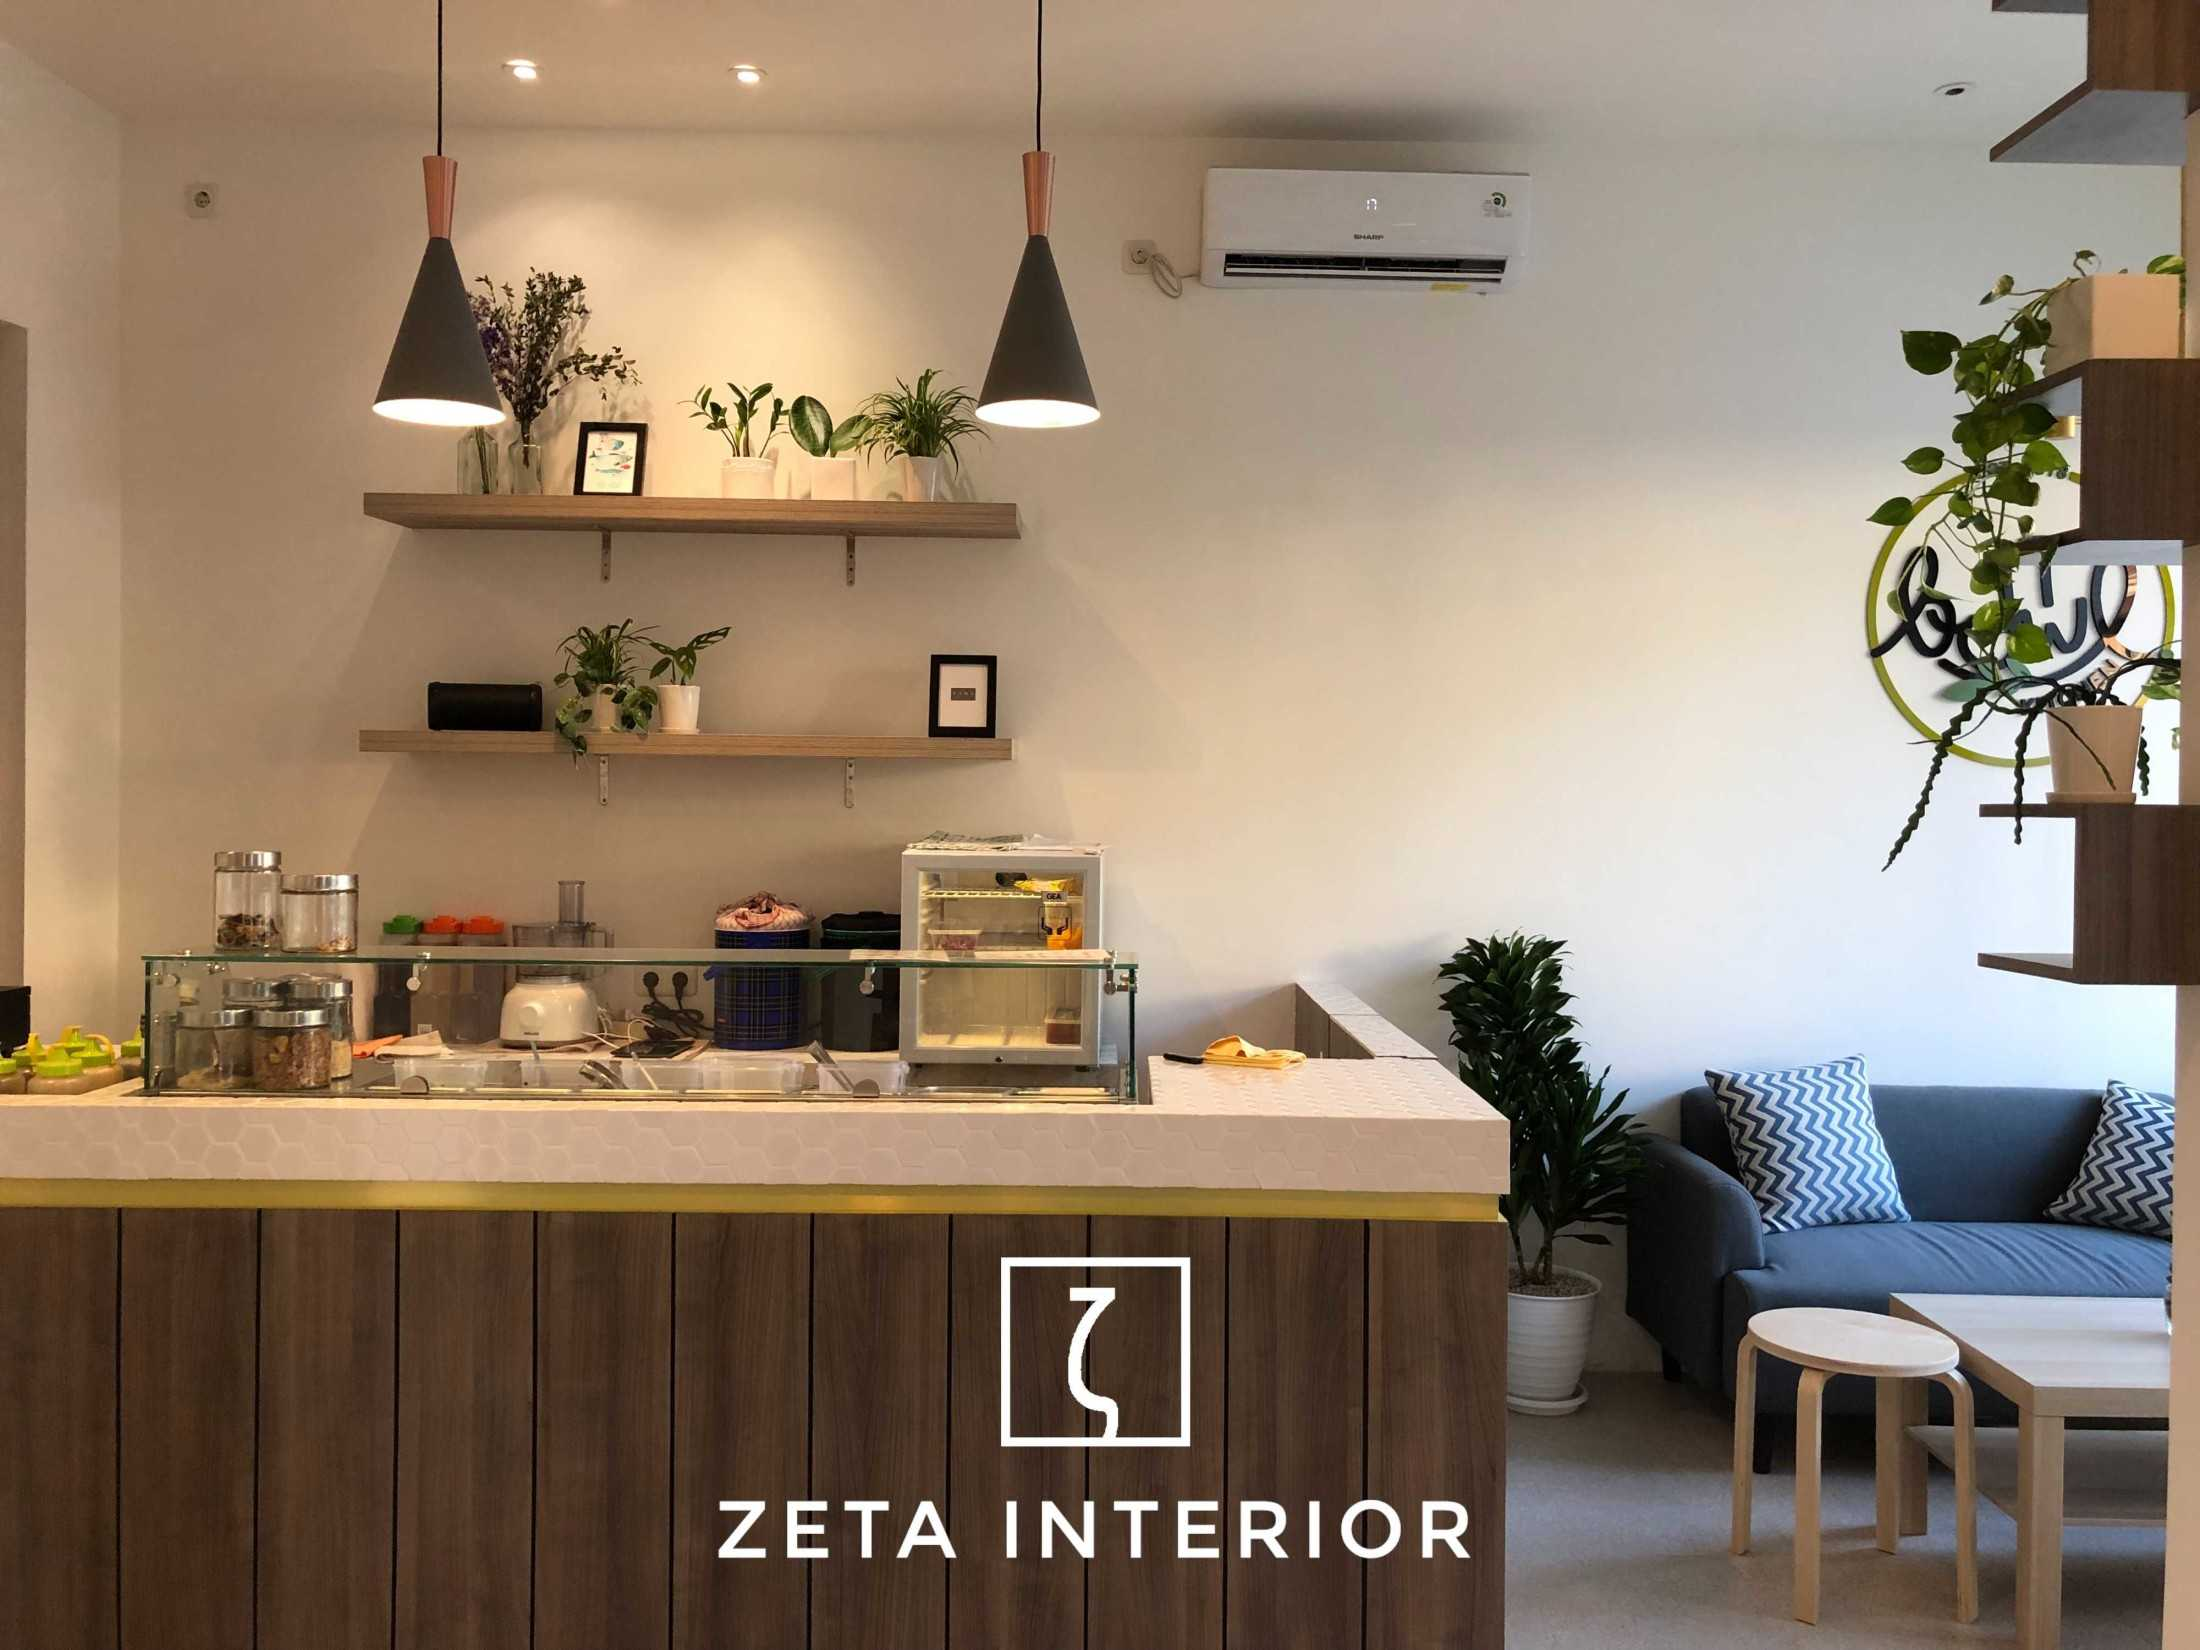 Zeta Interior Design It Bowl Kitchen Surabaya, Kota Sby, Jawa Timur, Indonesia Surabaya, Kota Sby, Jawa Timur, Indonesia Zeta-Interior-Design-It-Bowl-Kitchen  74954